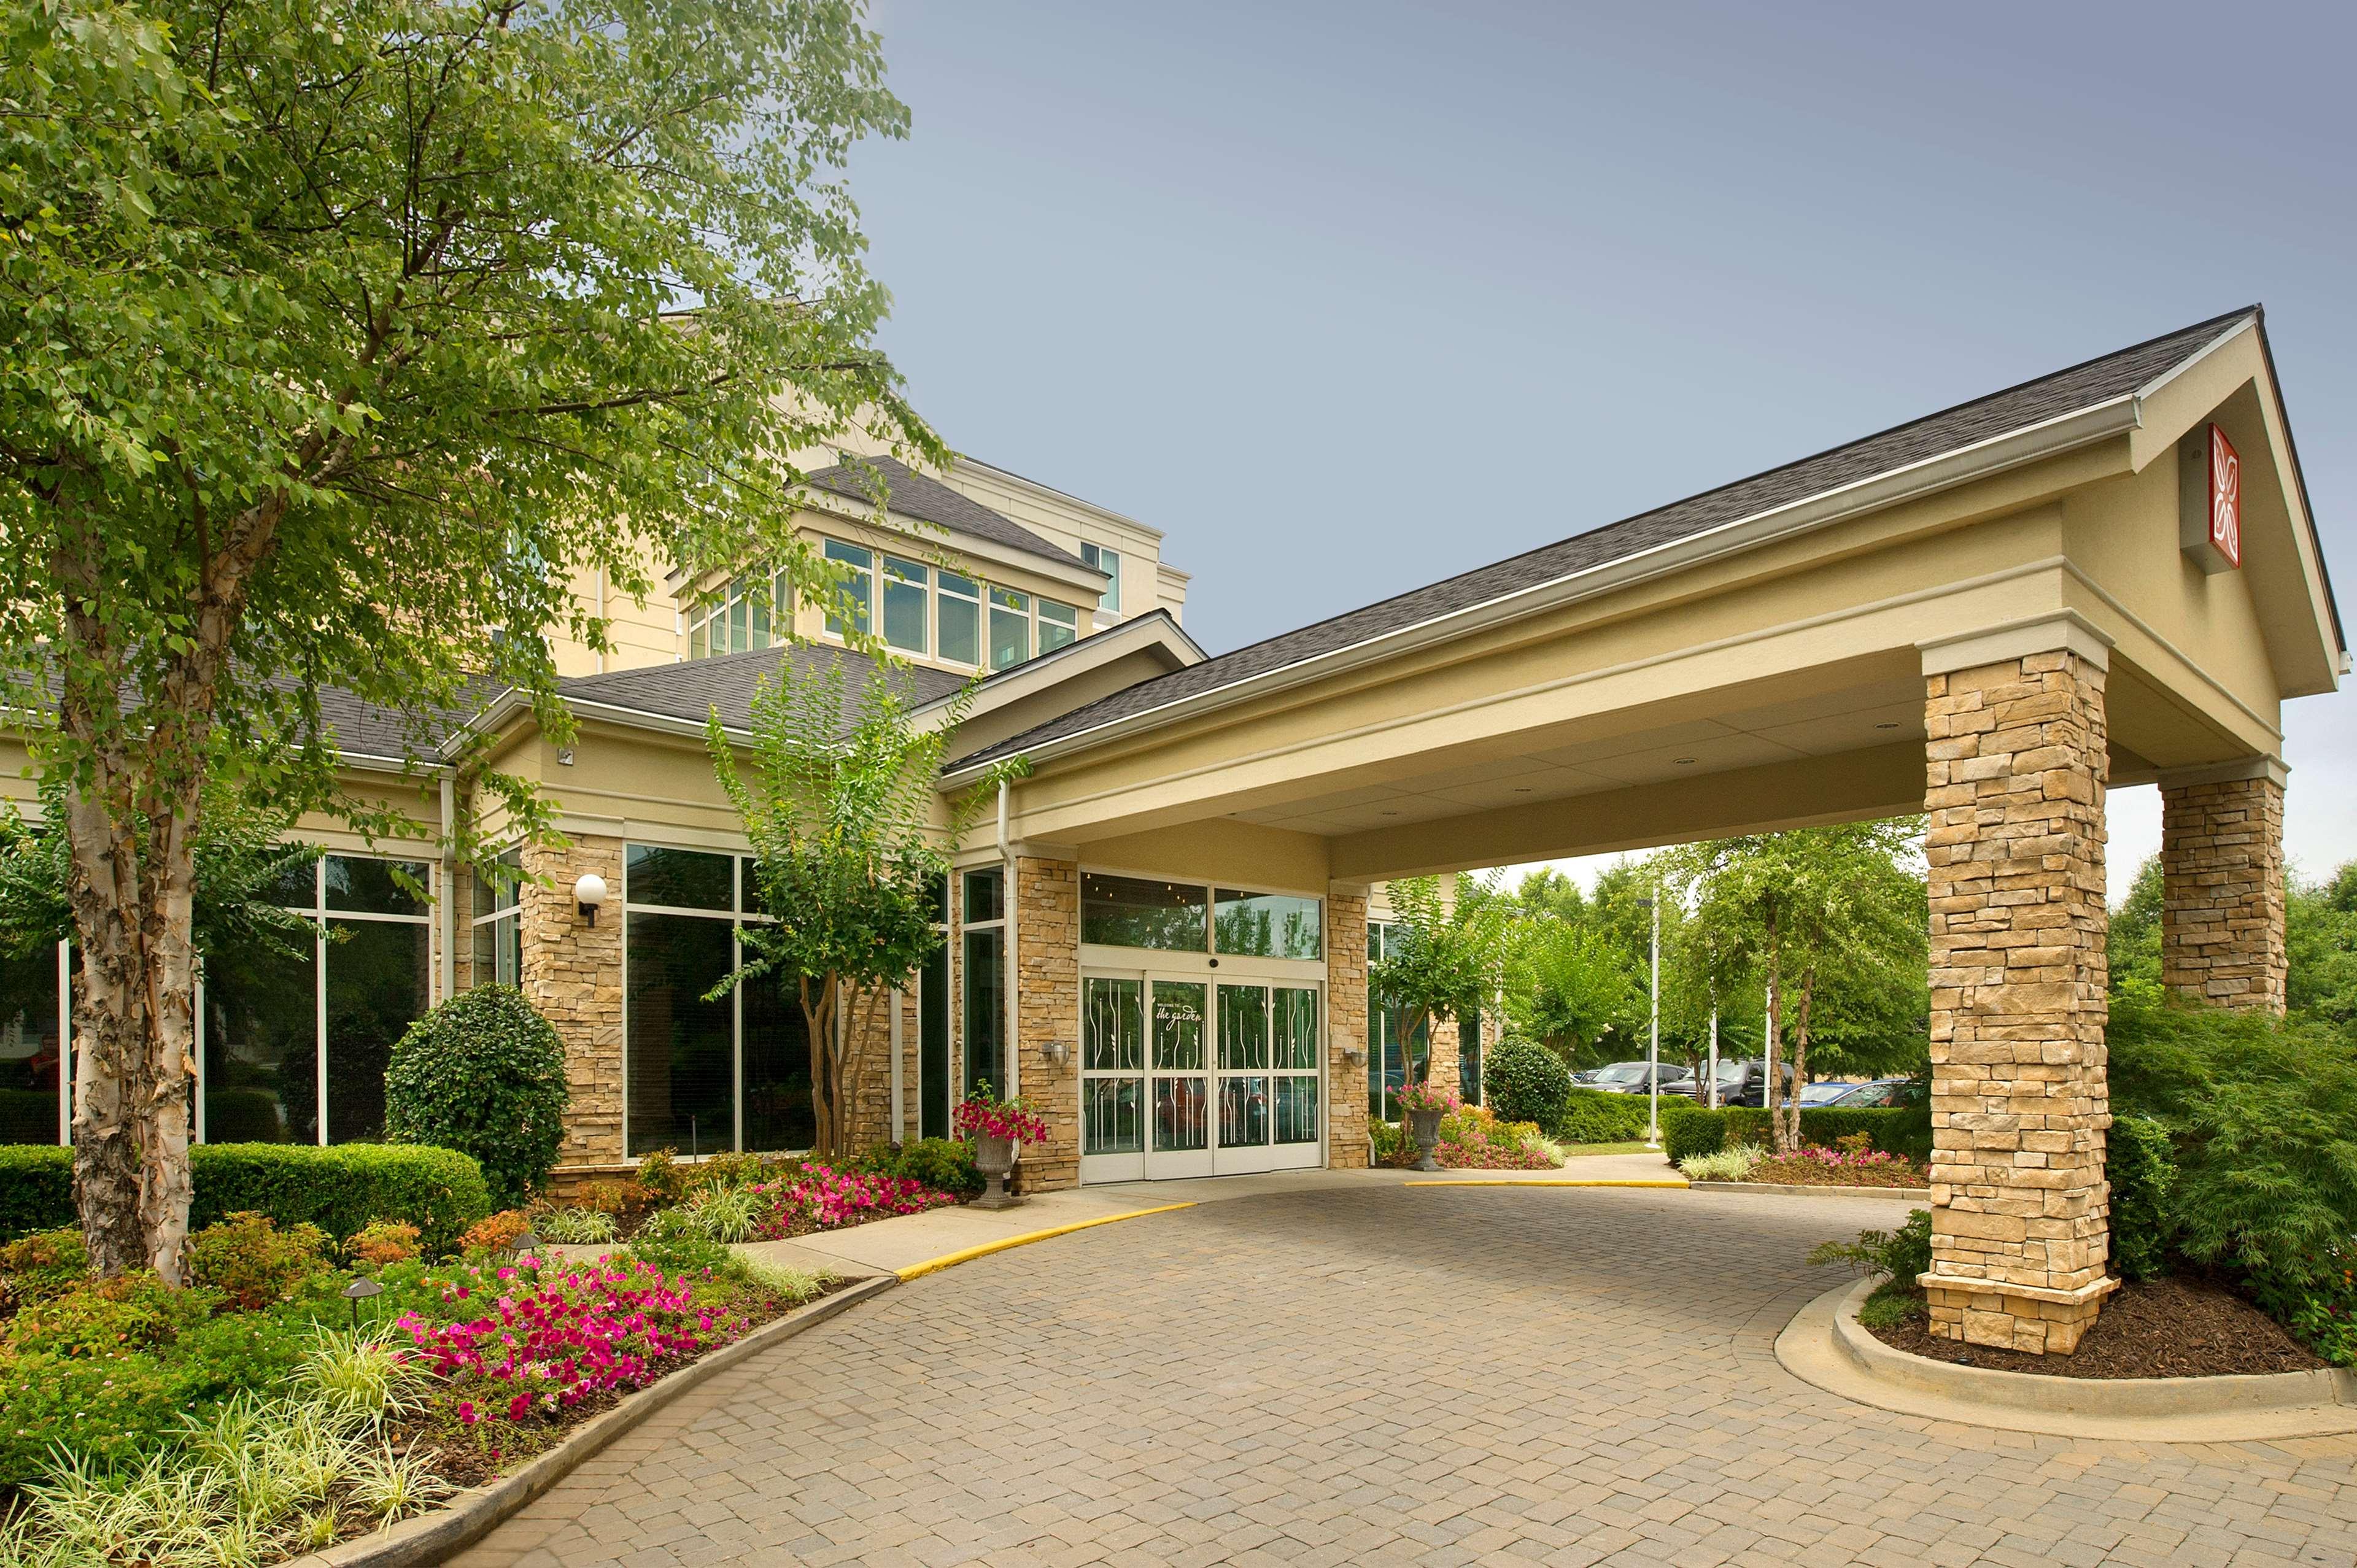 Hilton Garden Inn Atlanta NW/Kennesaw Town Center image 0